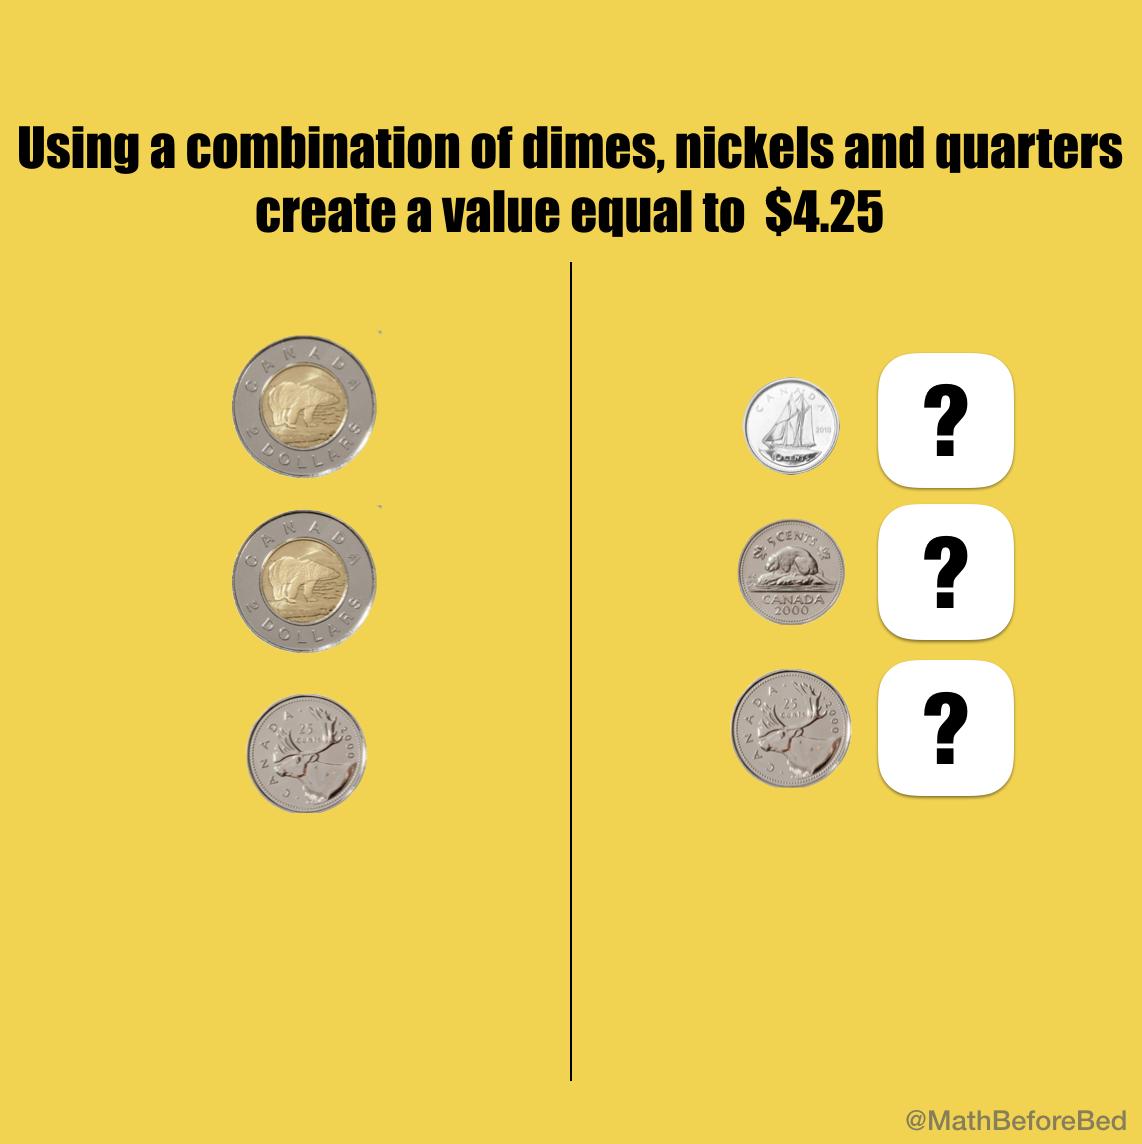 Create $4.25